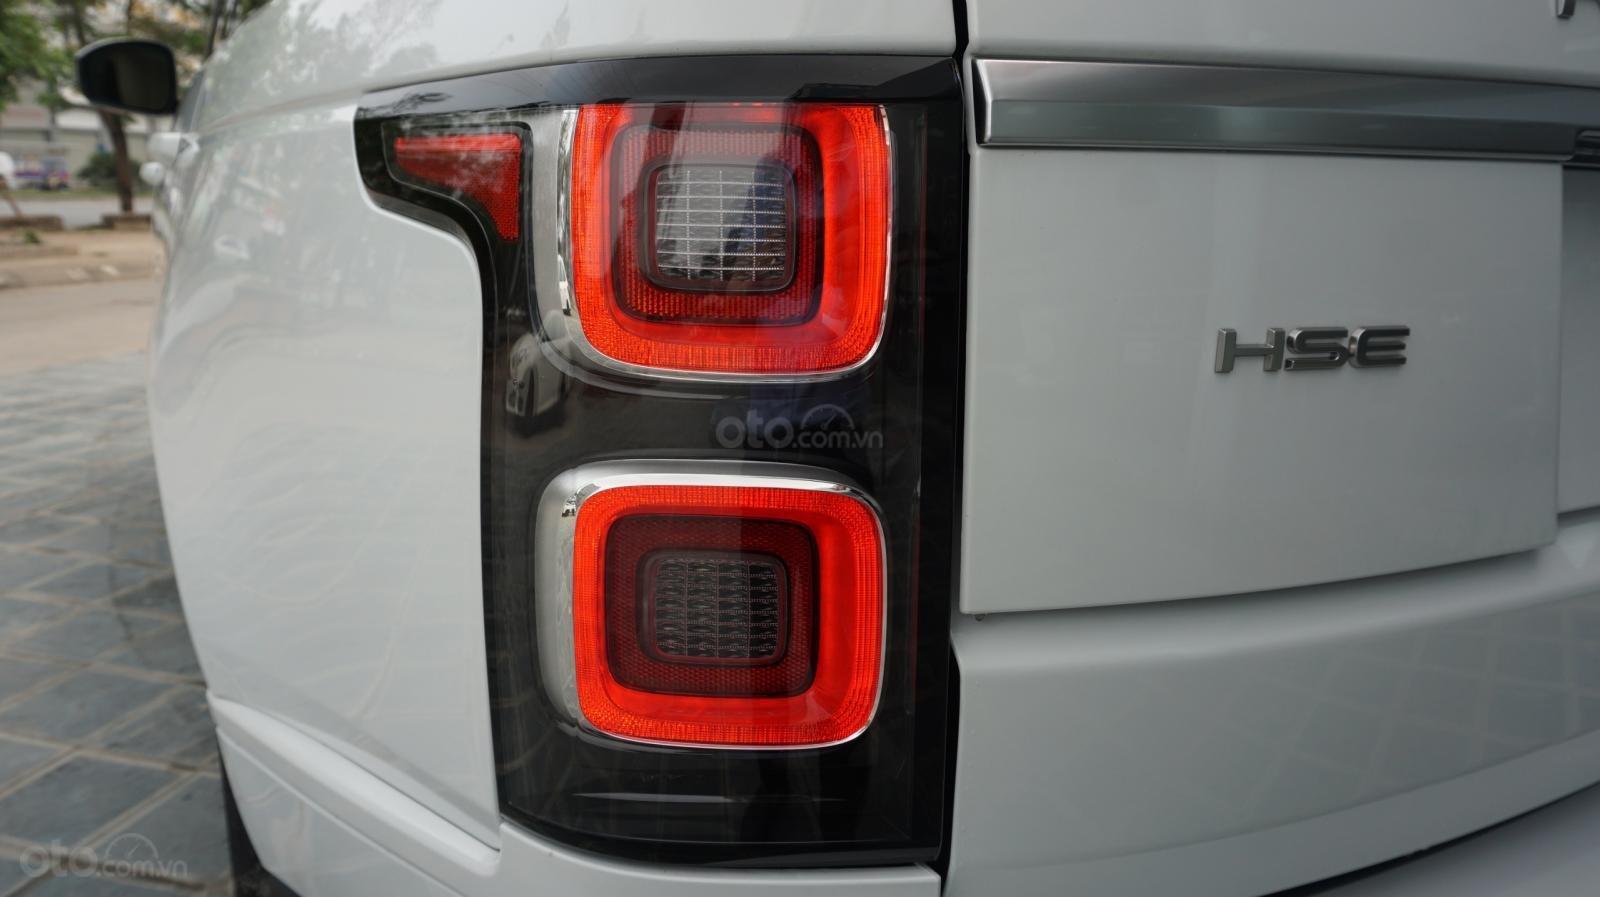 Cần bán xe LandRover Range Rover HSE năm 2019, màu trắng, xe nhập-4